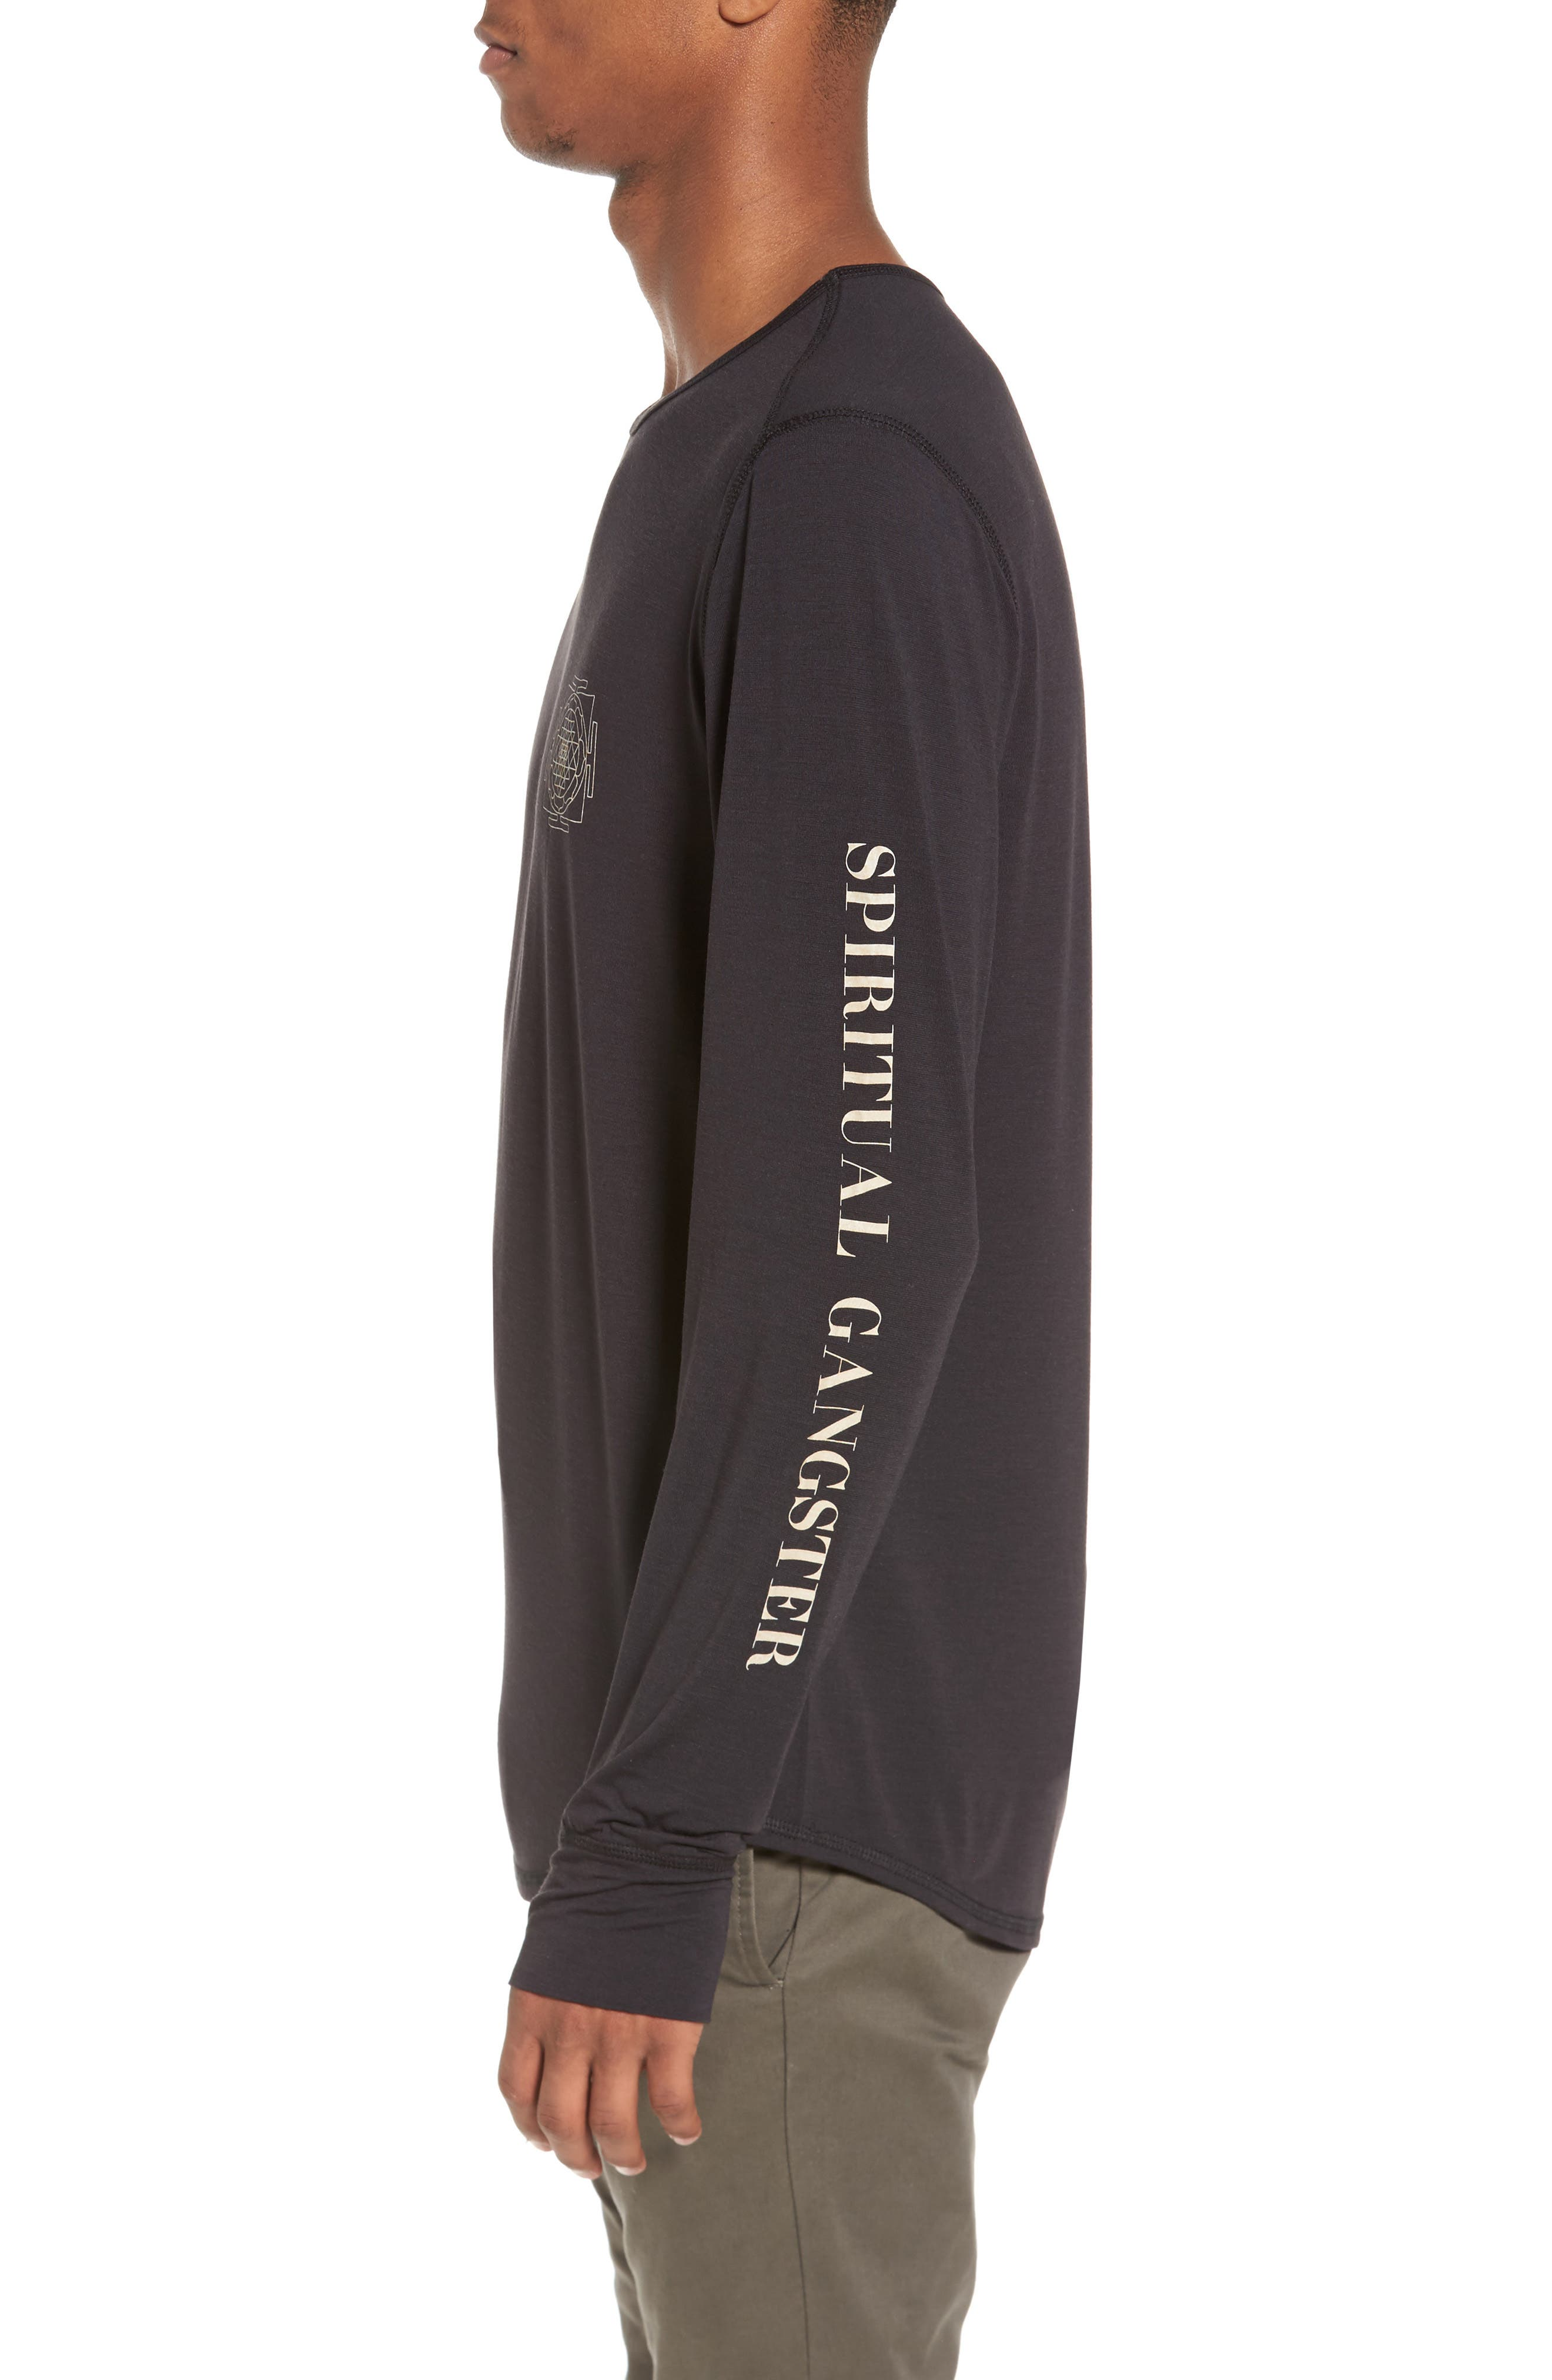 Yantra Wave T-Shirt,                             Alternate thumbnail 3, color,                             Black/ Black